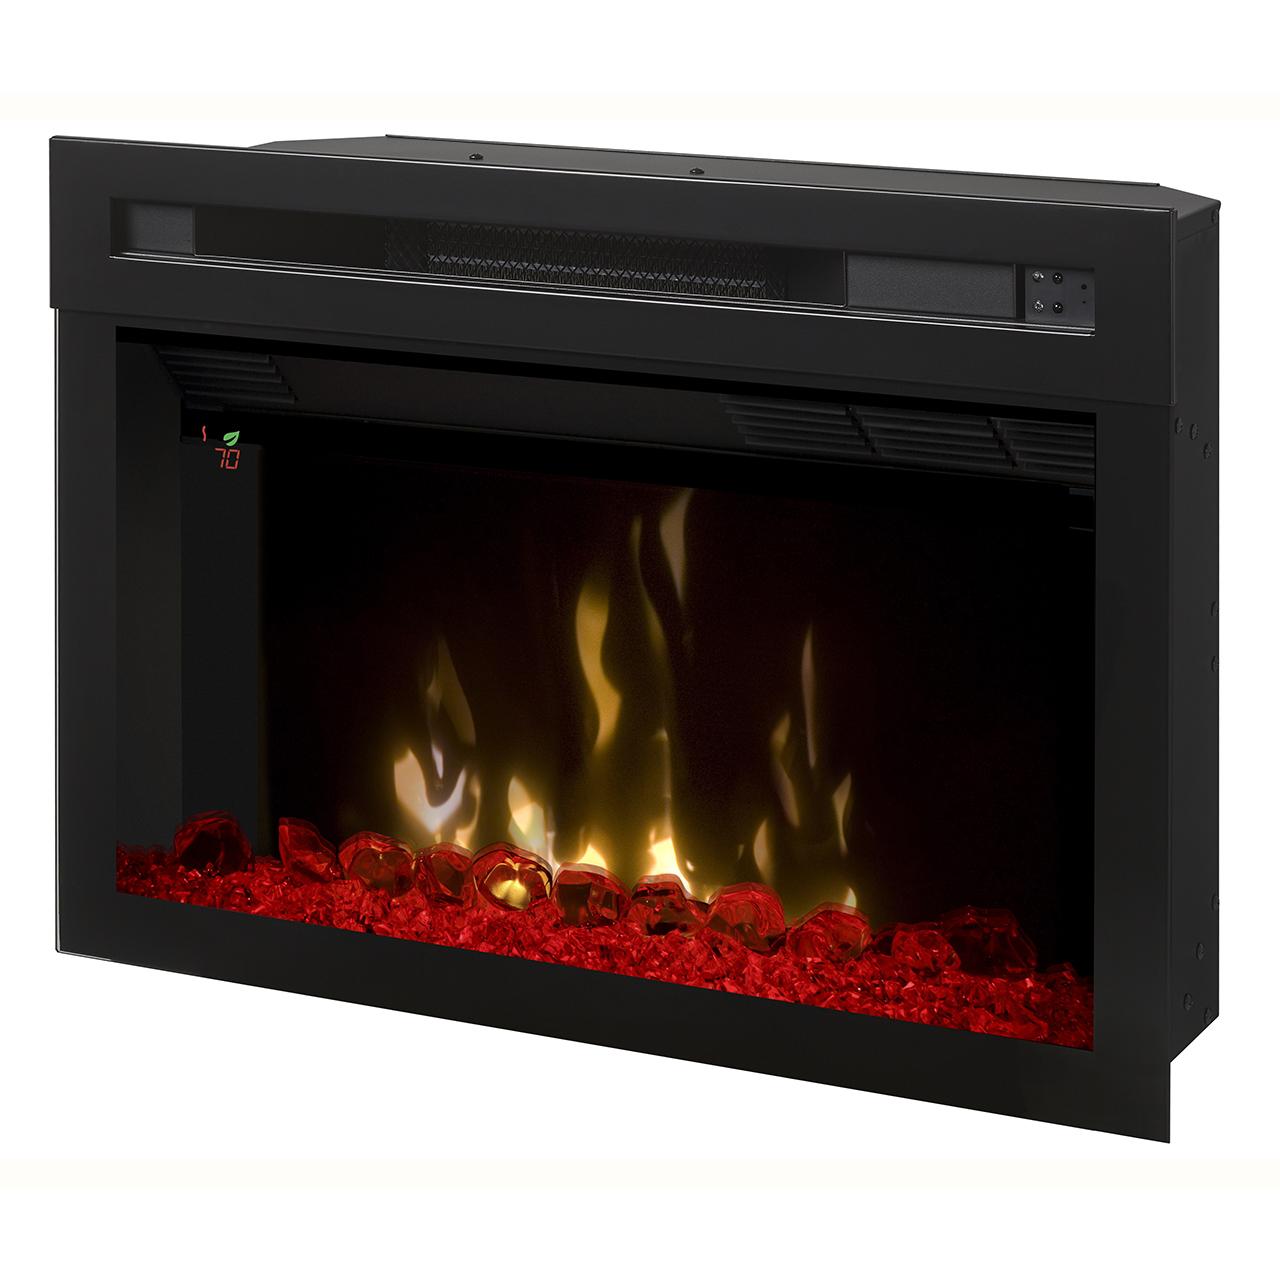 Dimplex 25 Quot Multi Fire Xd Electric Firebox Pf2325hg